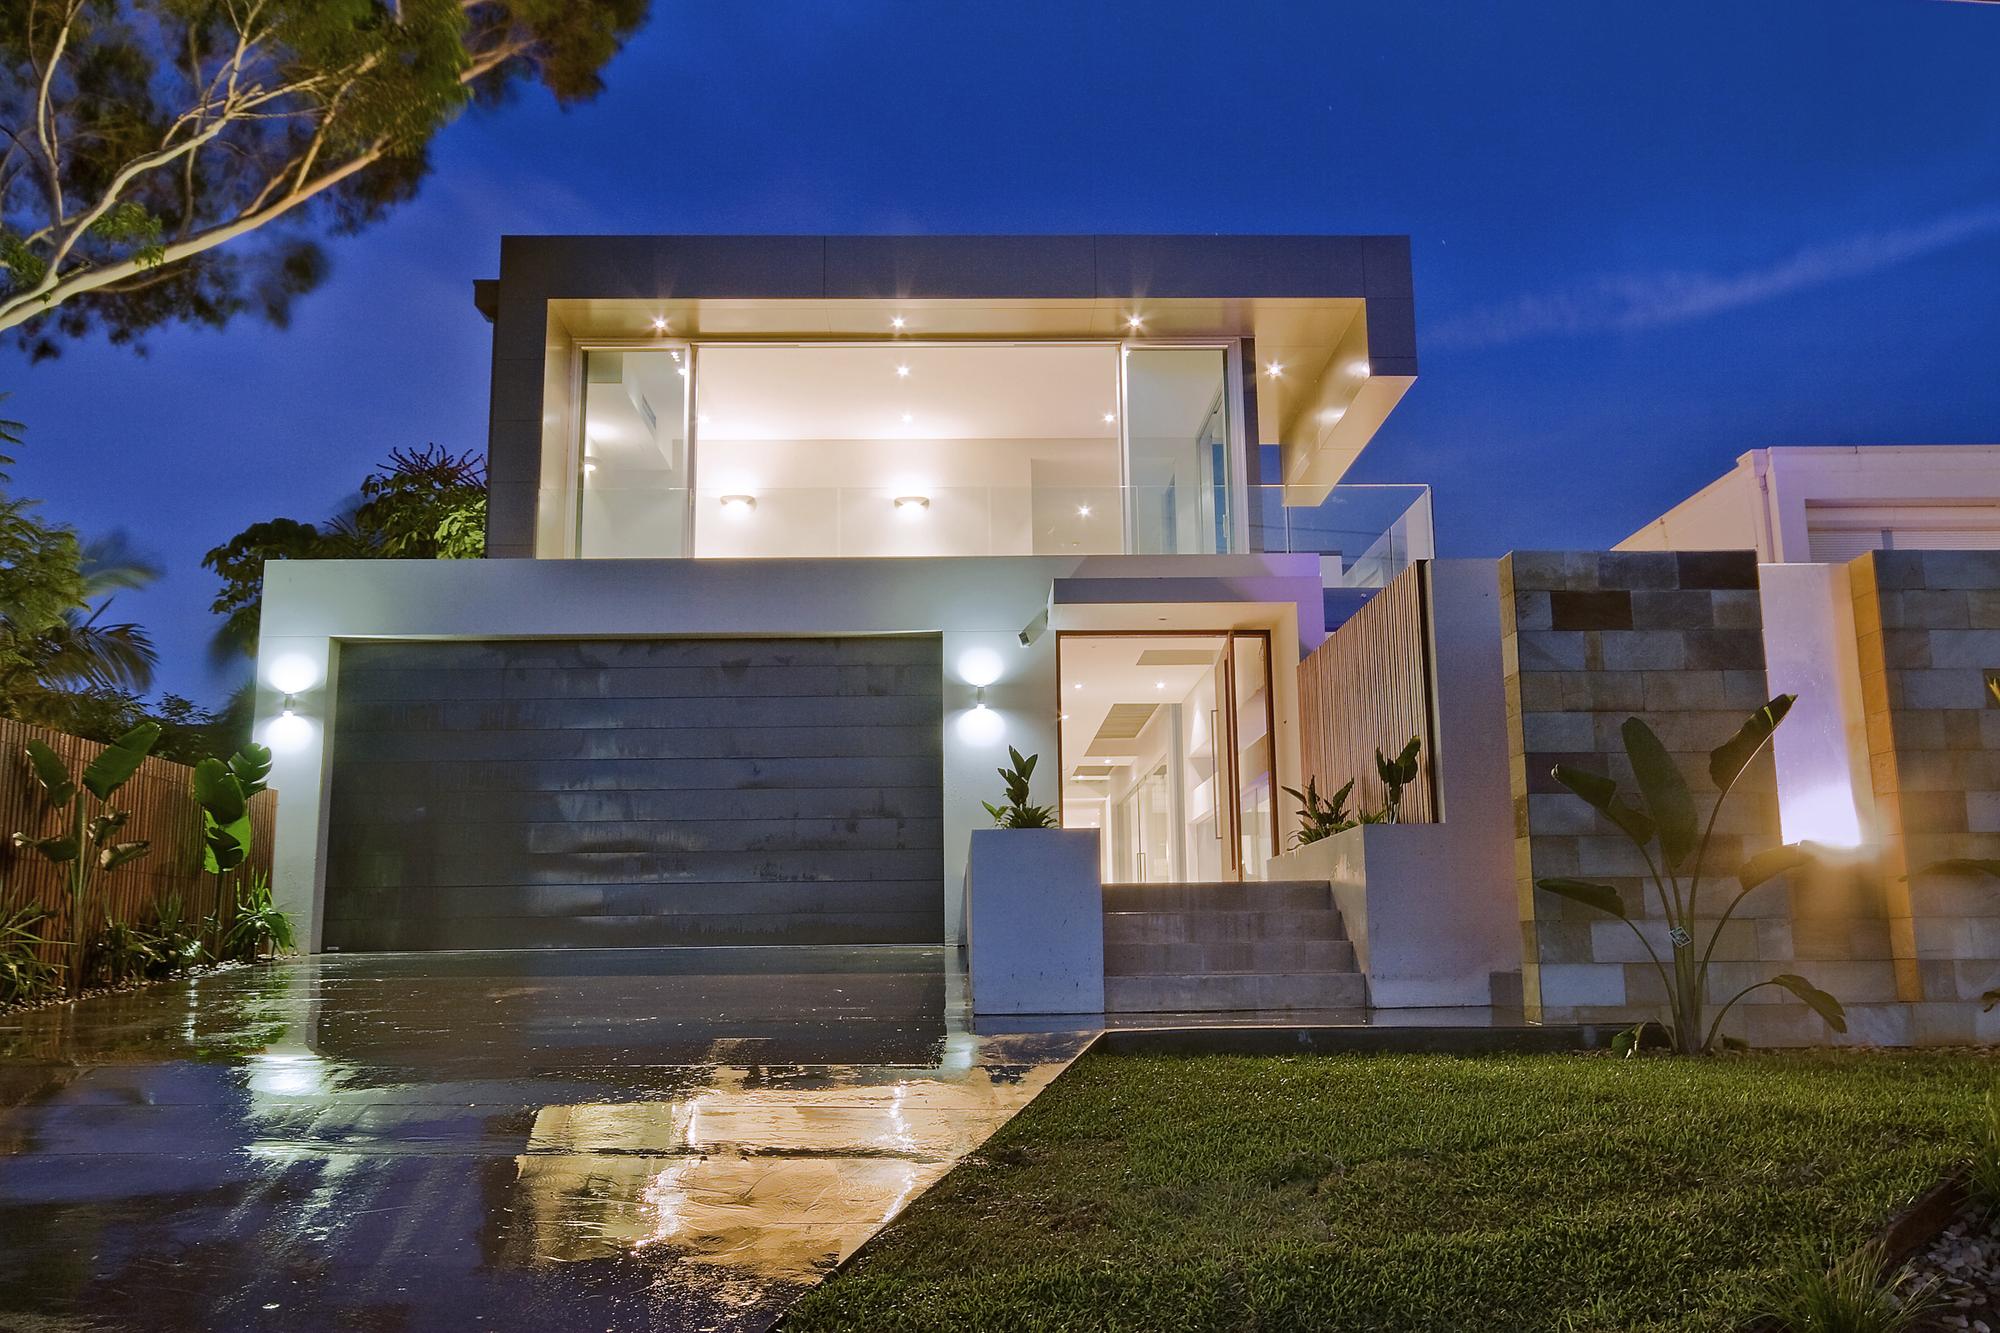 Kangaroo Point House / DMJ Design Studio, © IMAGEination & C. Ocampo